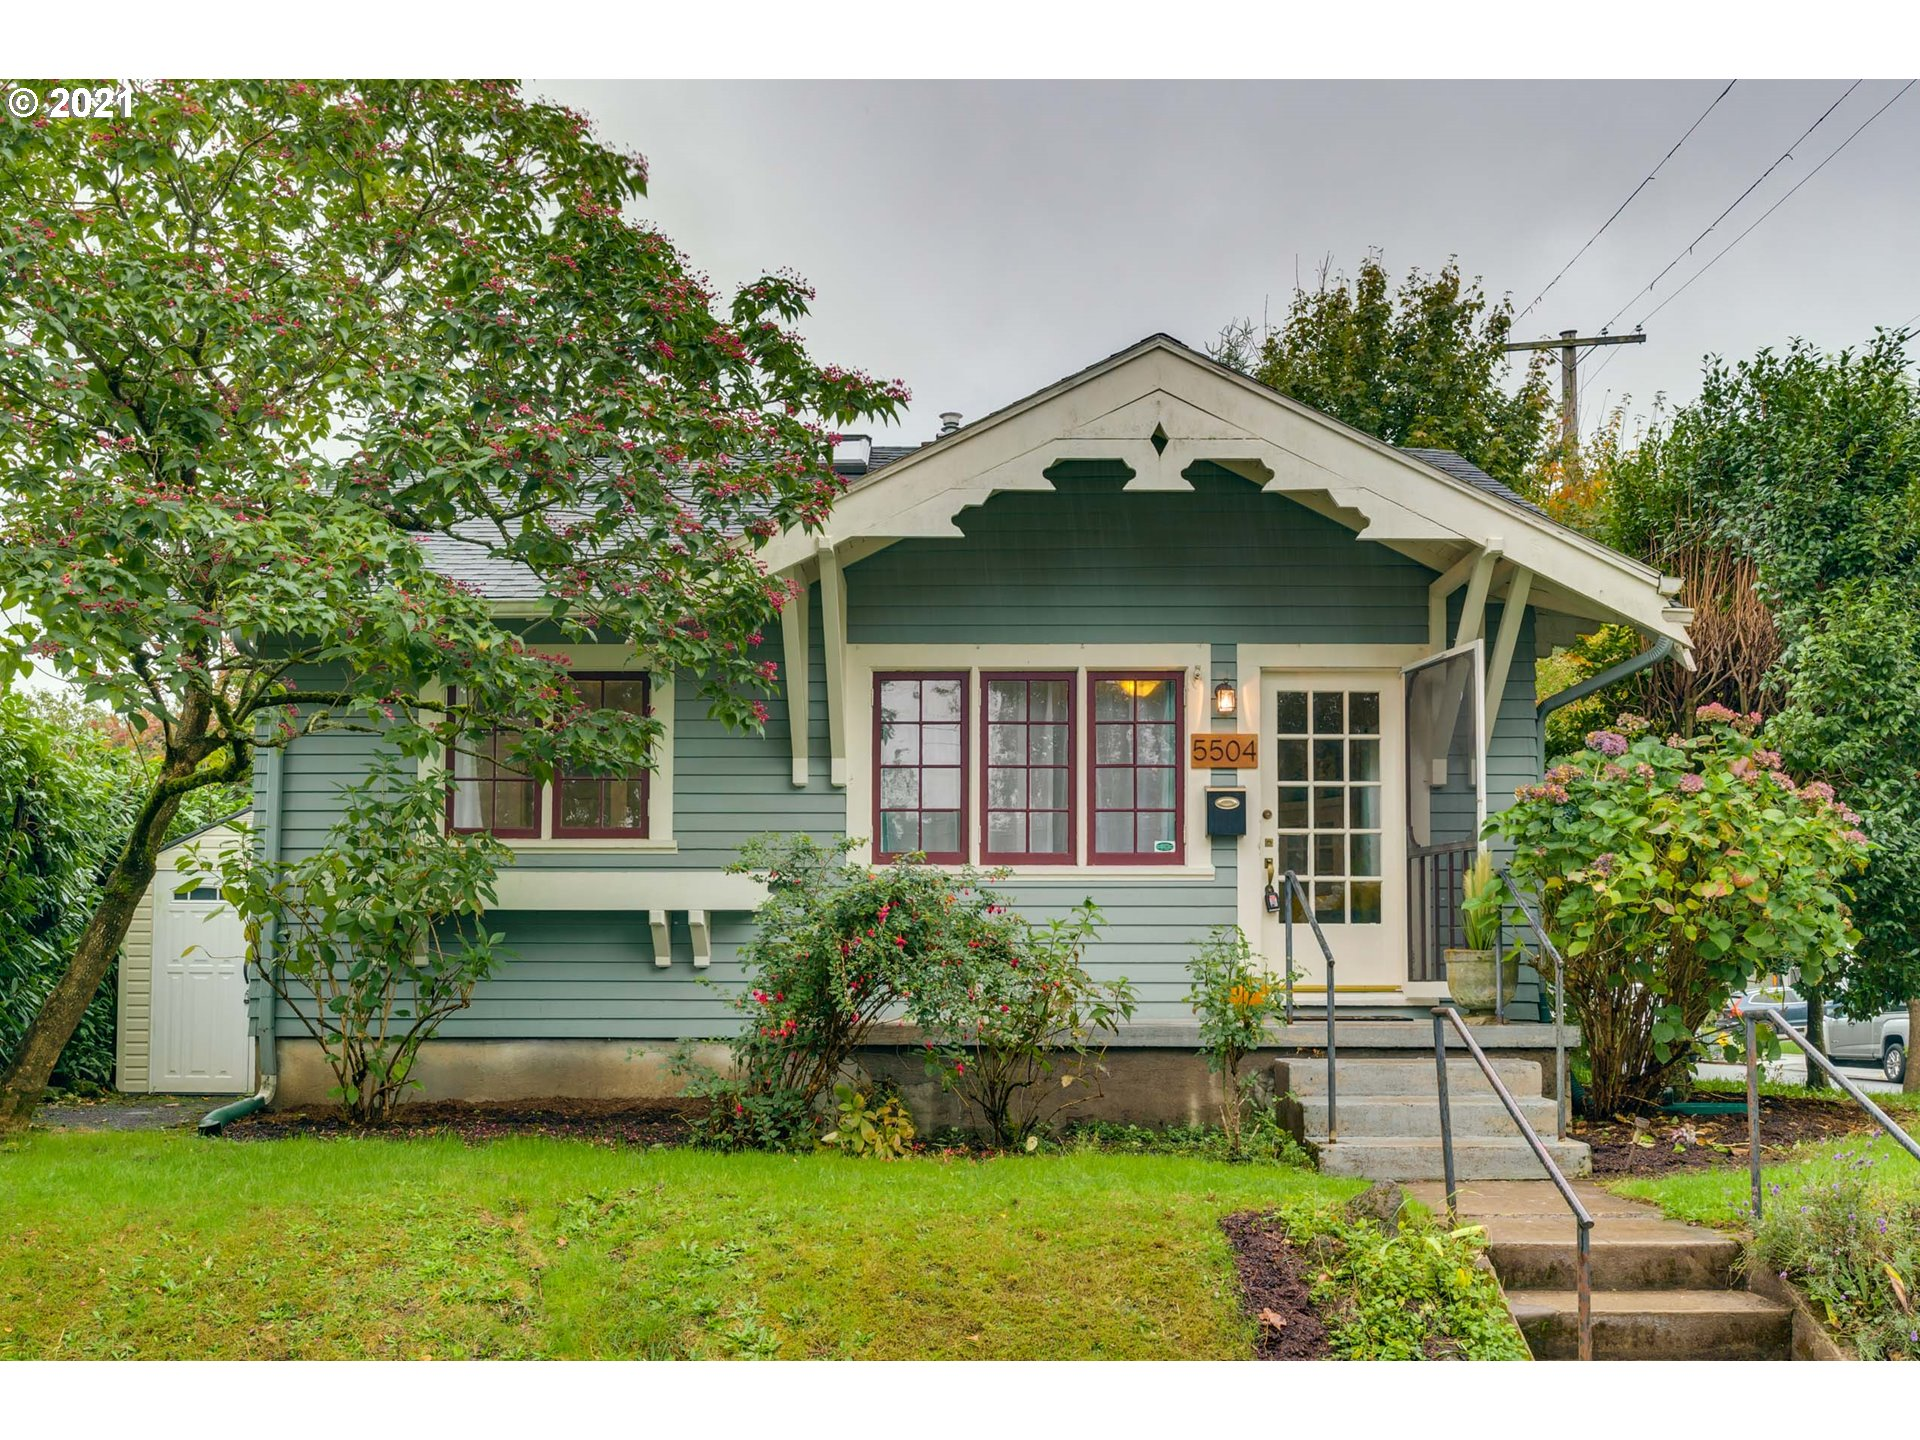 5504 SE ANKENY ST, Portland OR 97215